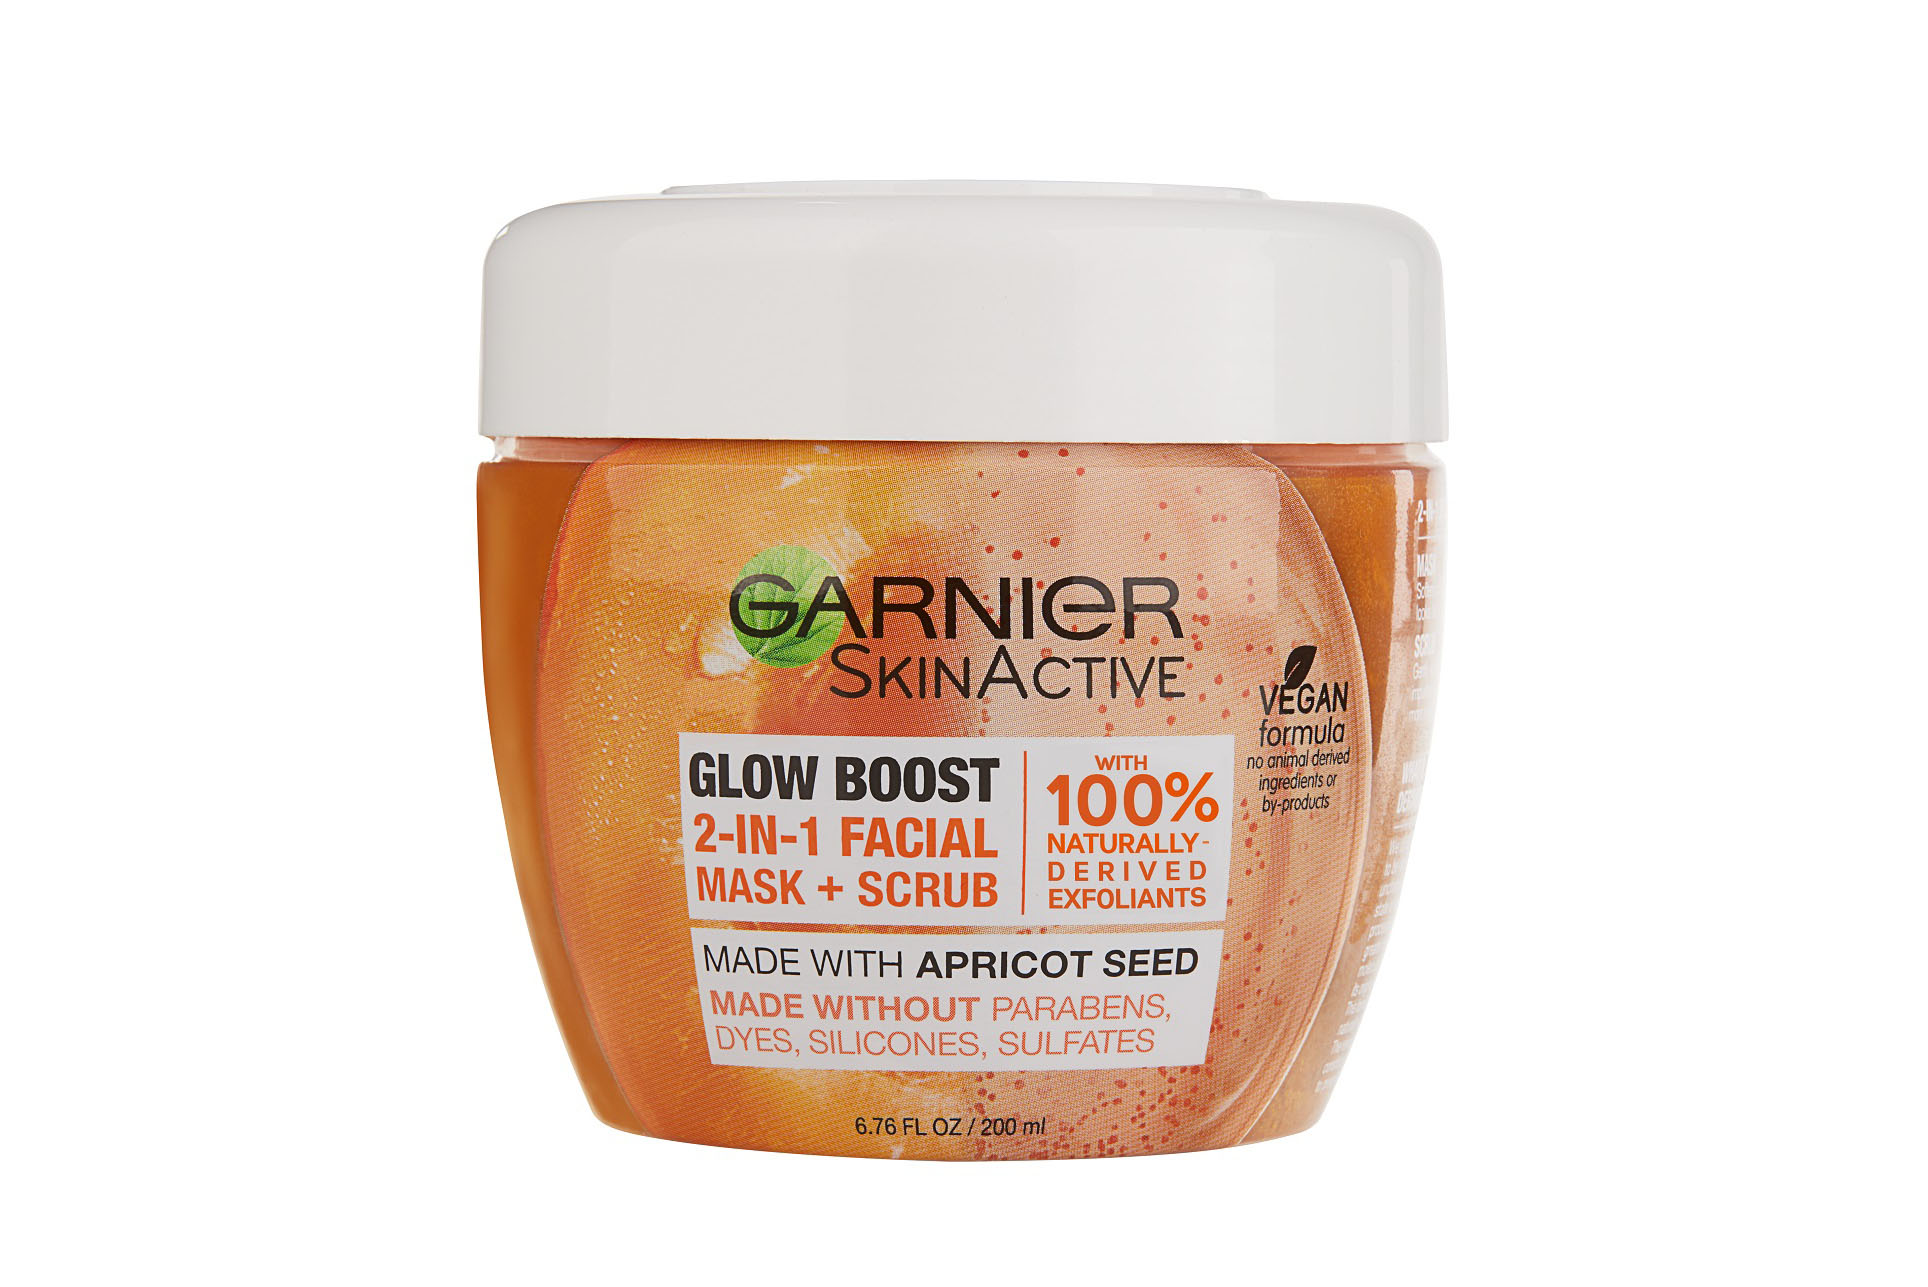 Garnier SkinActive Glow-Boost 2-in-1 Facial Mask and Scrub